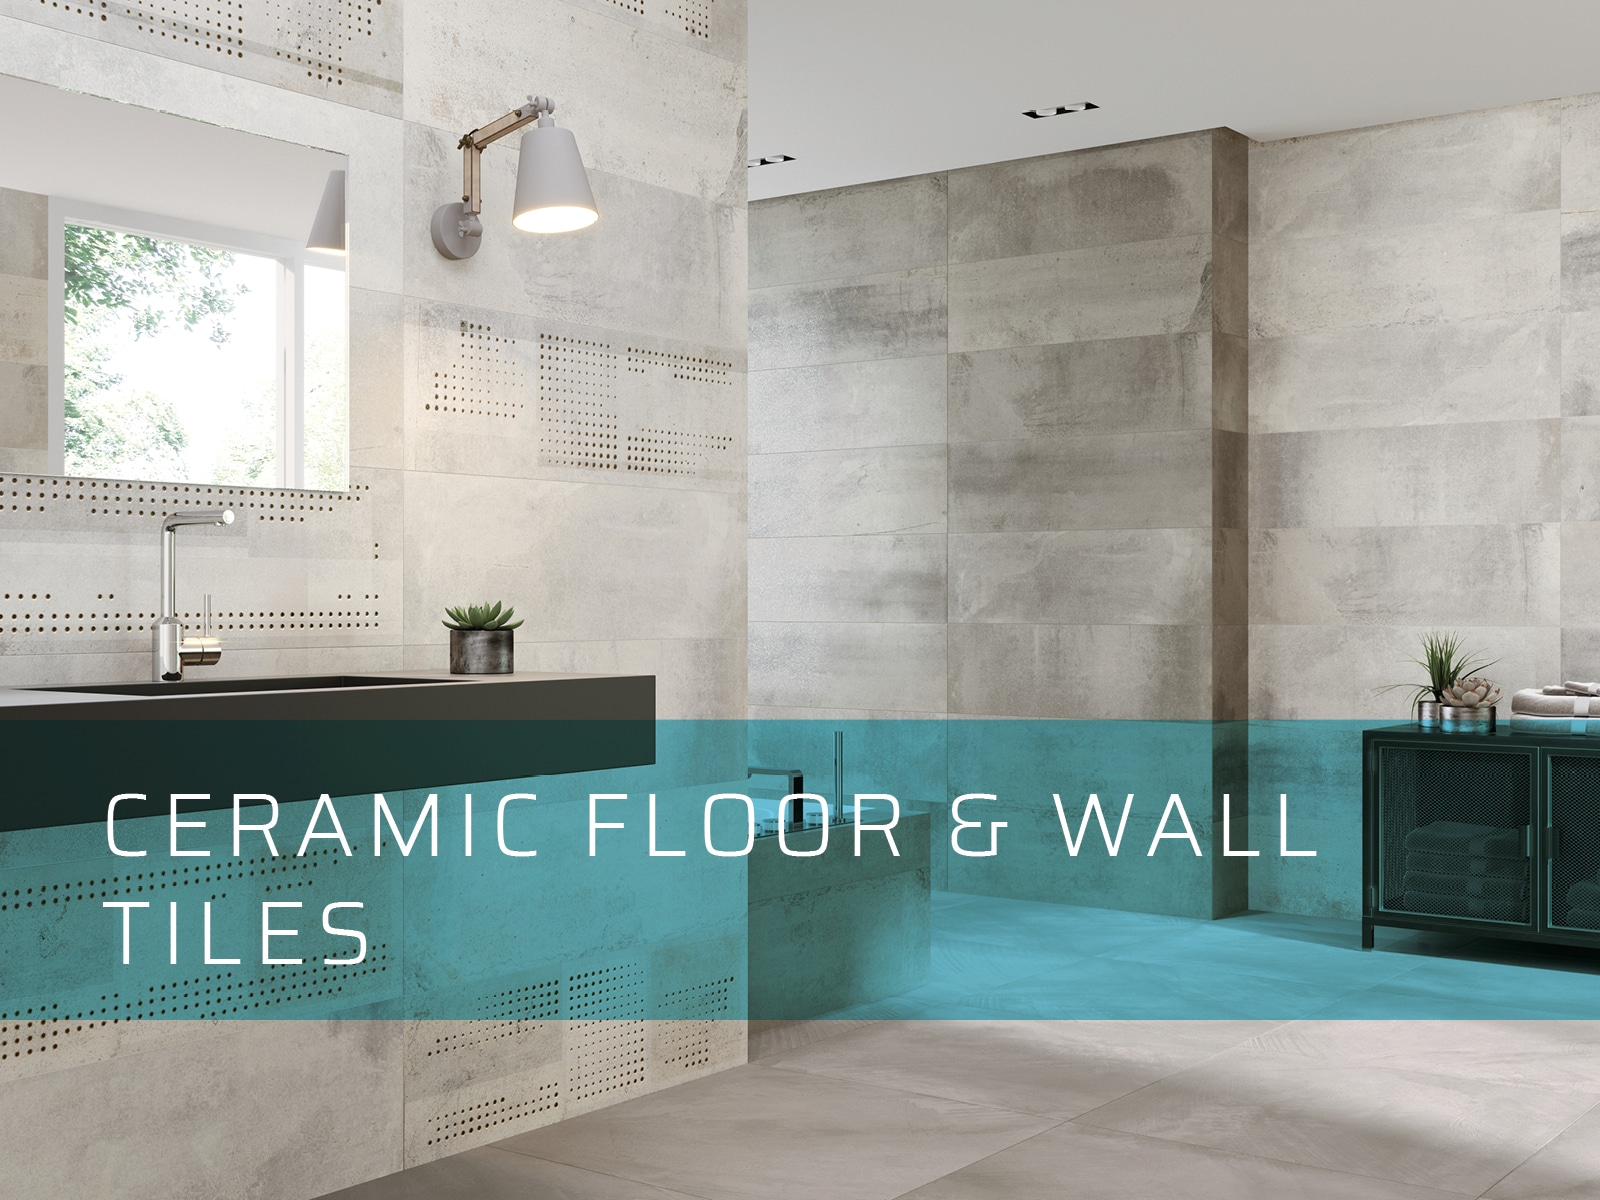 Ceramic Floor & Wall Tiles - Dalply